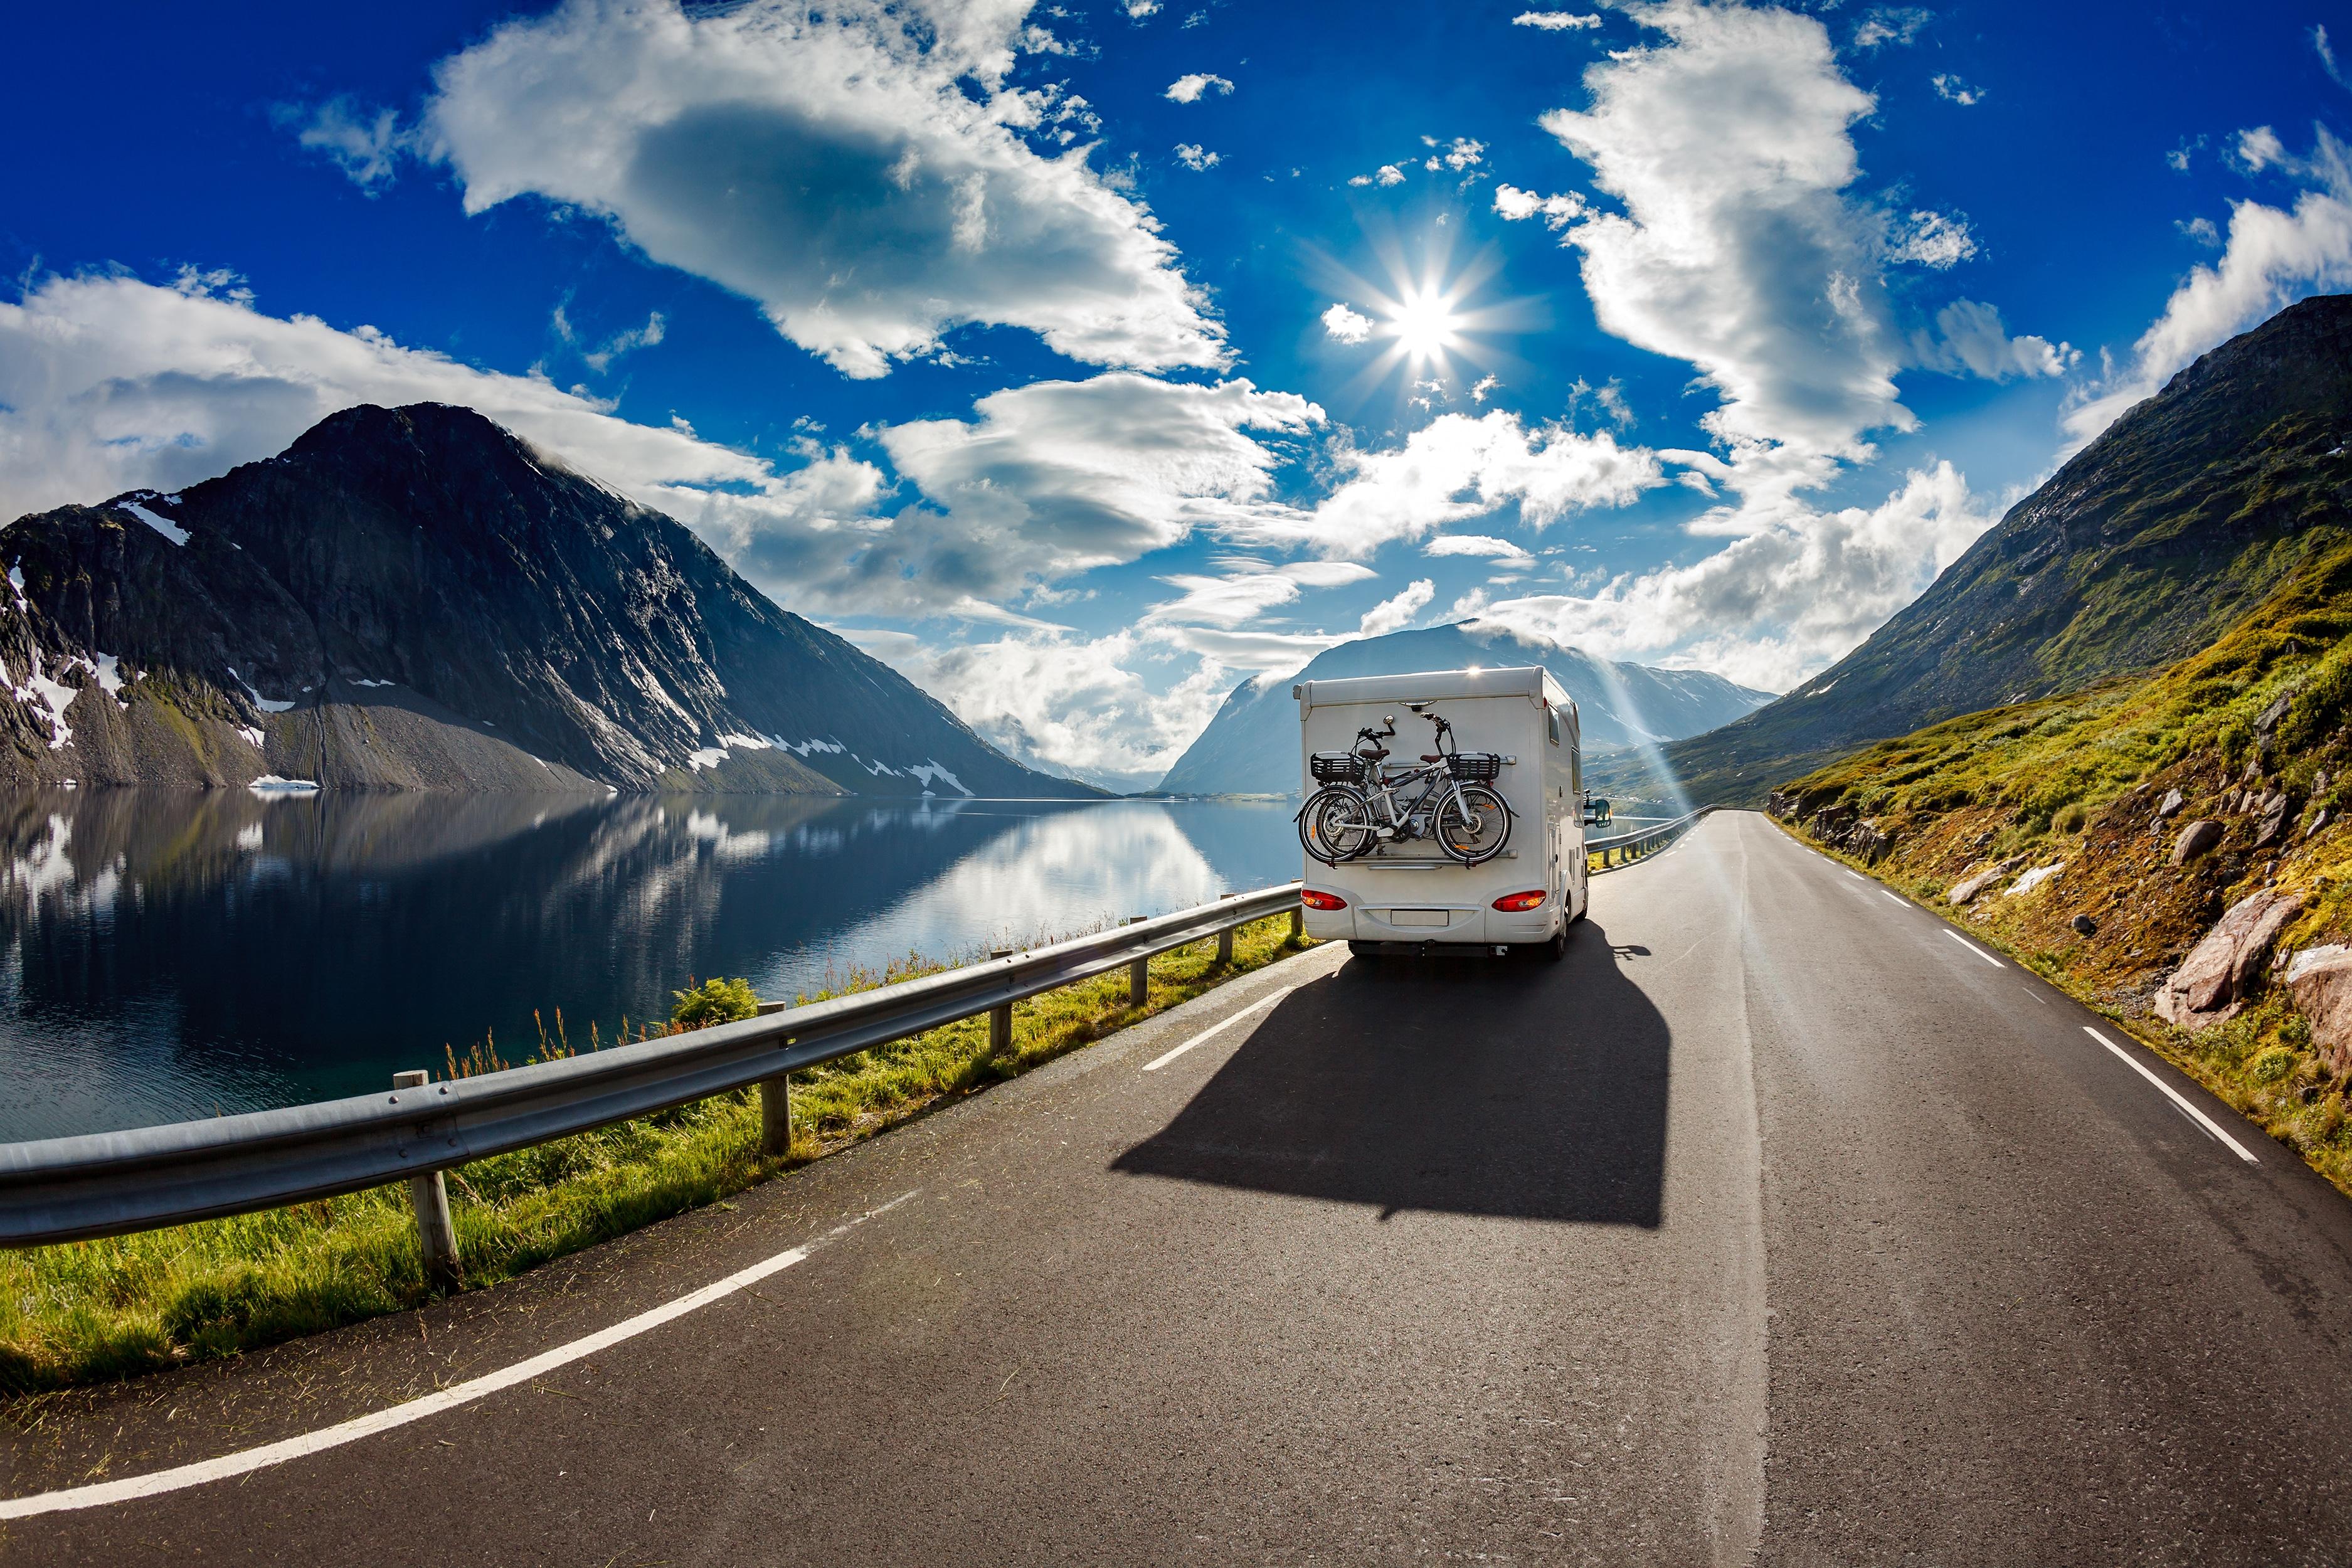 RV on scenic highway